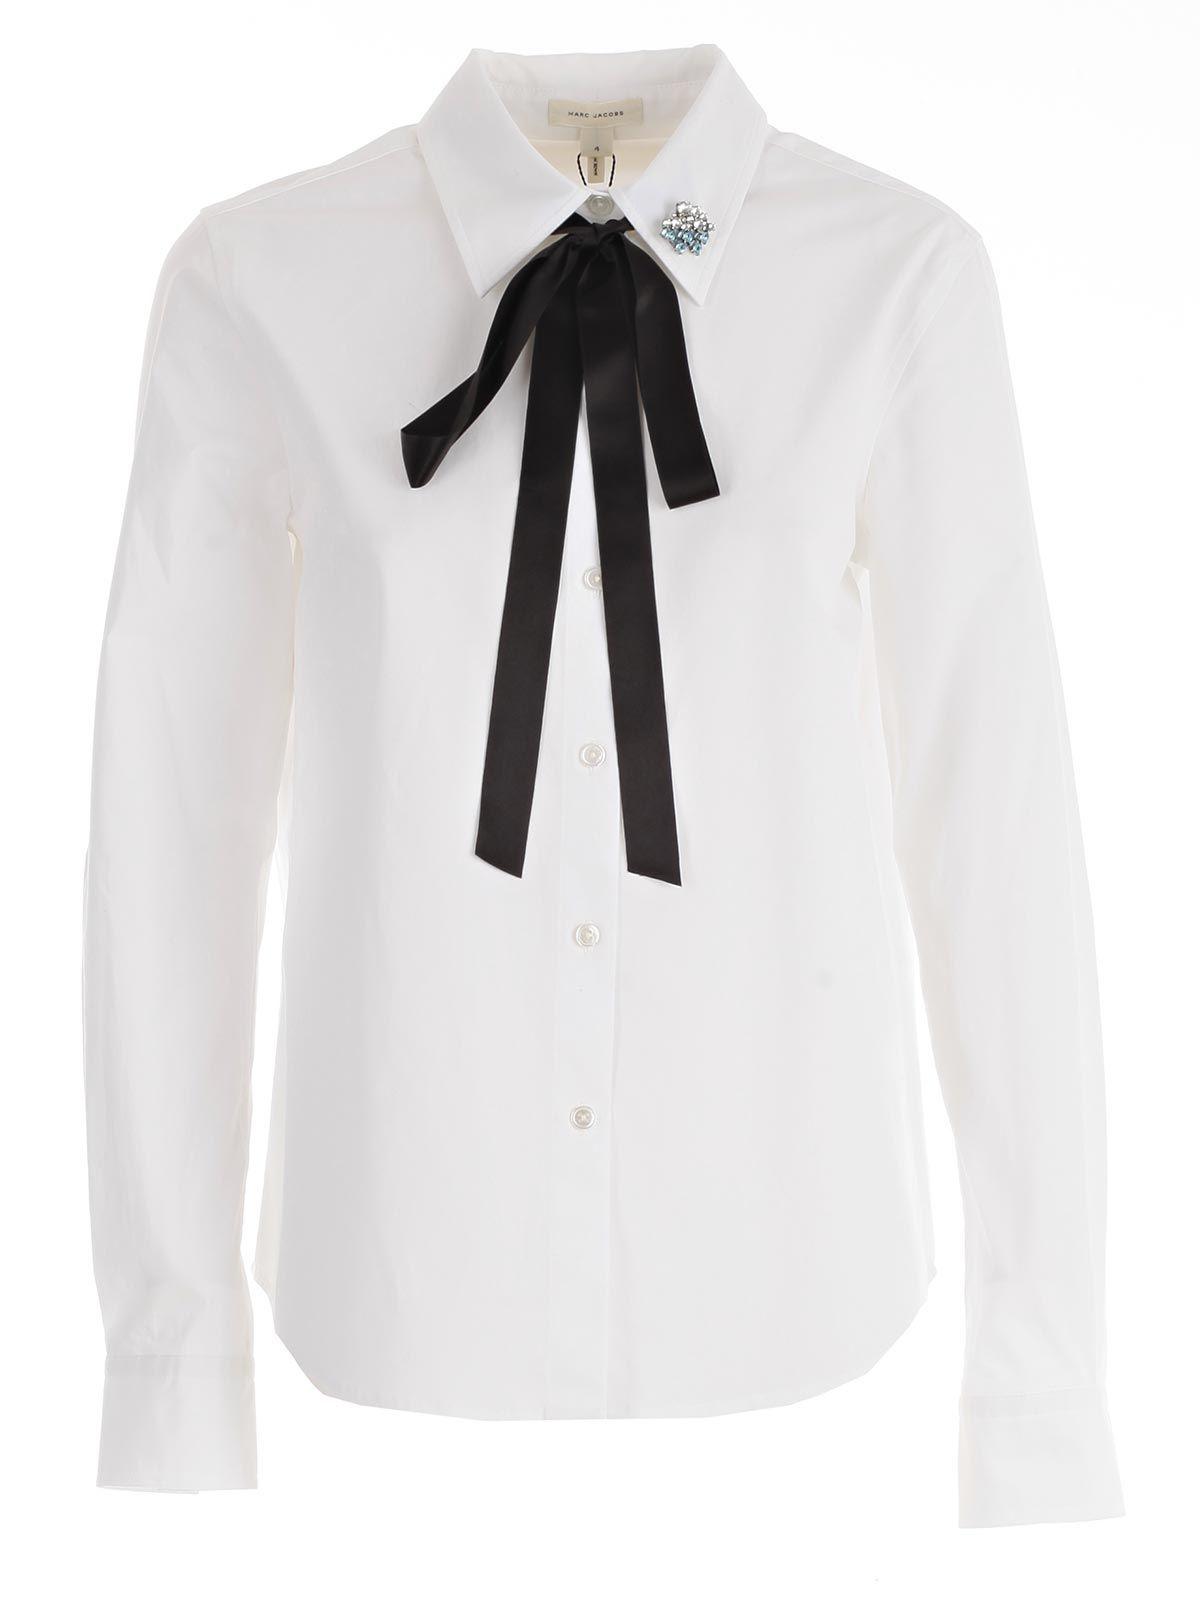 Marc Jacobs Shirt